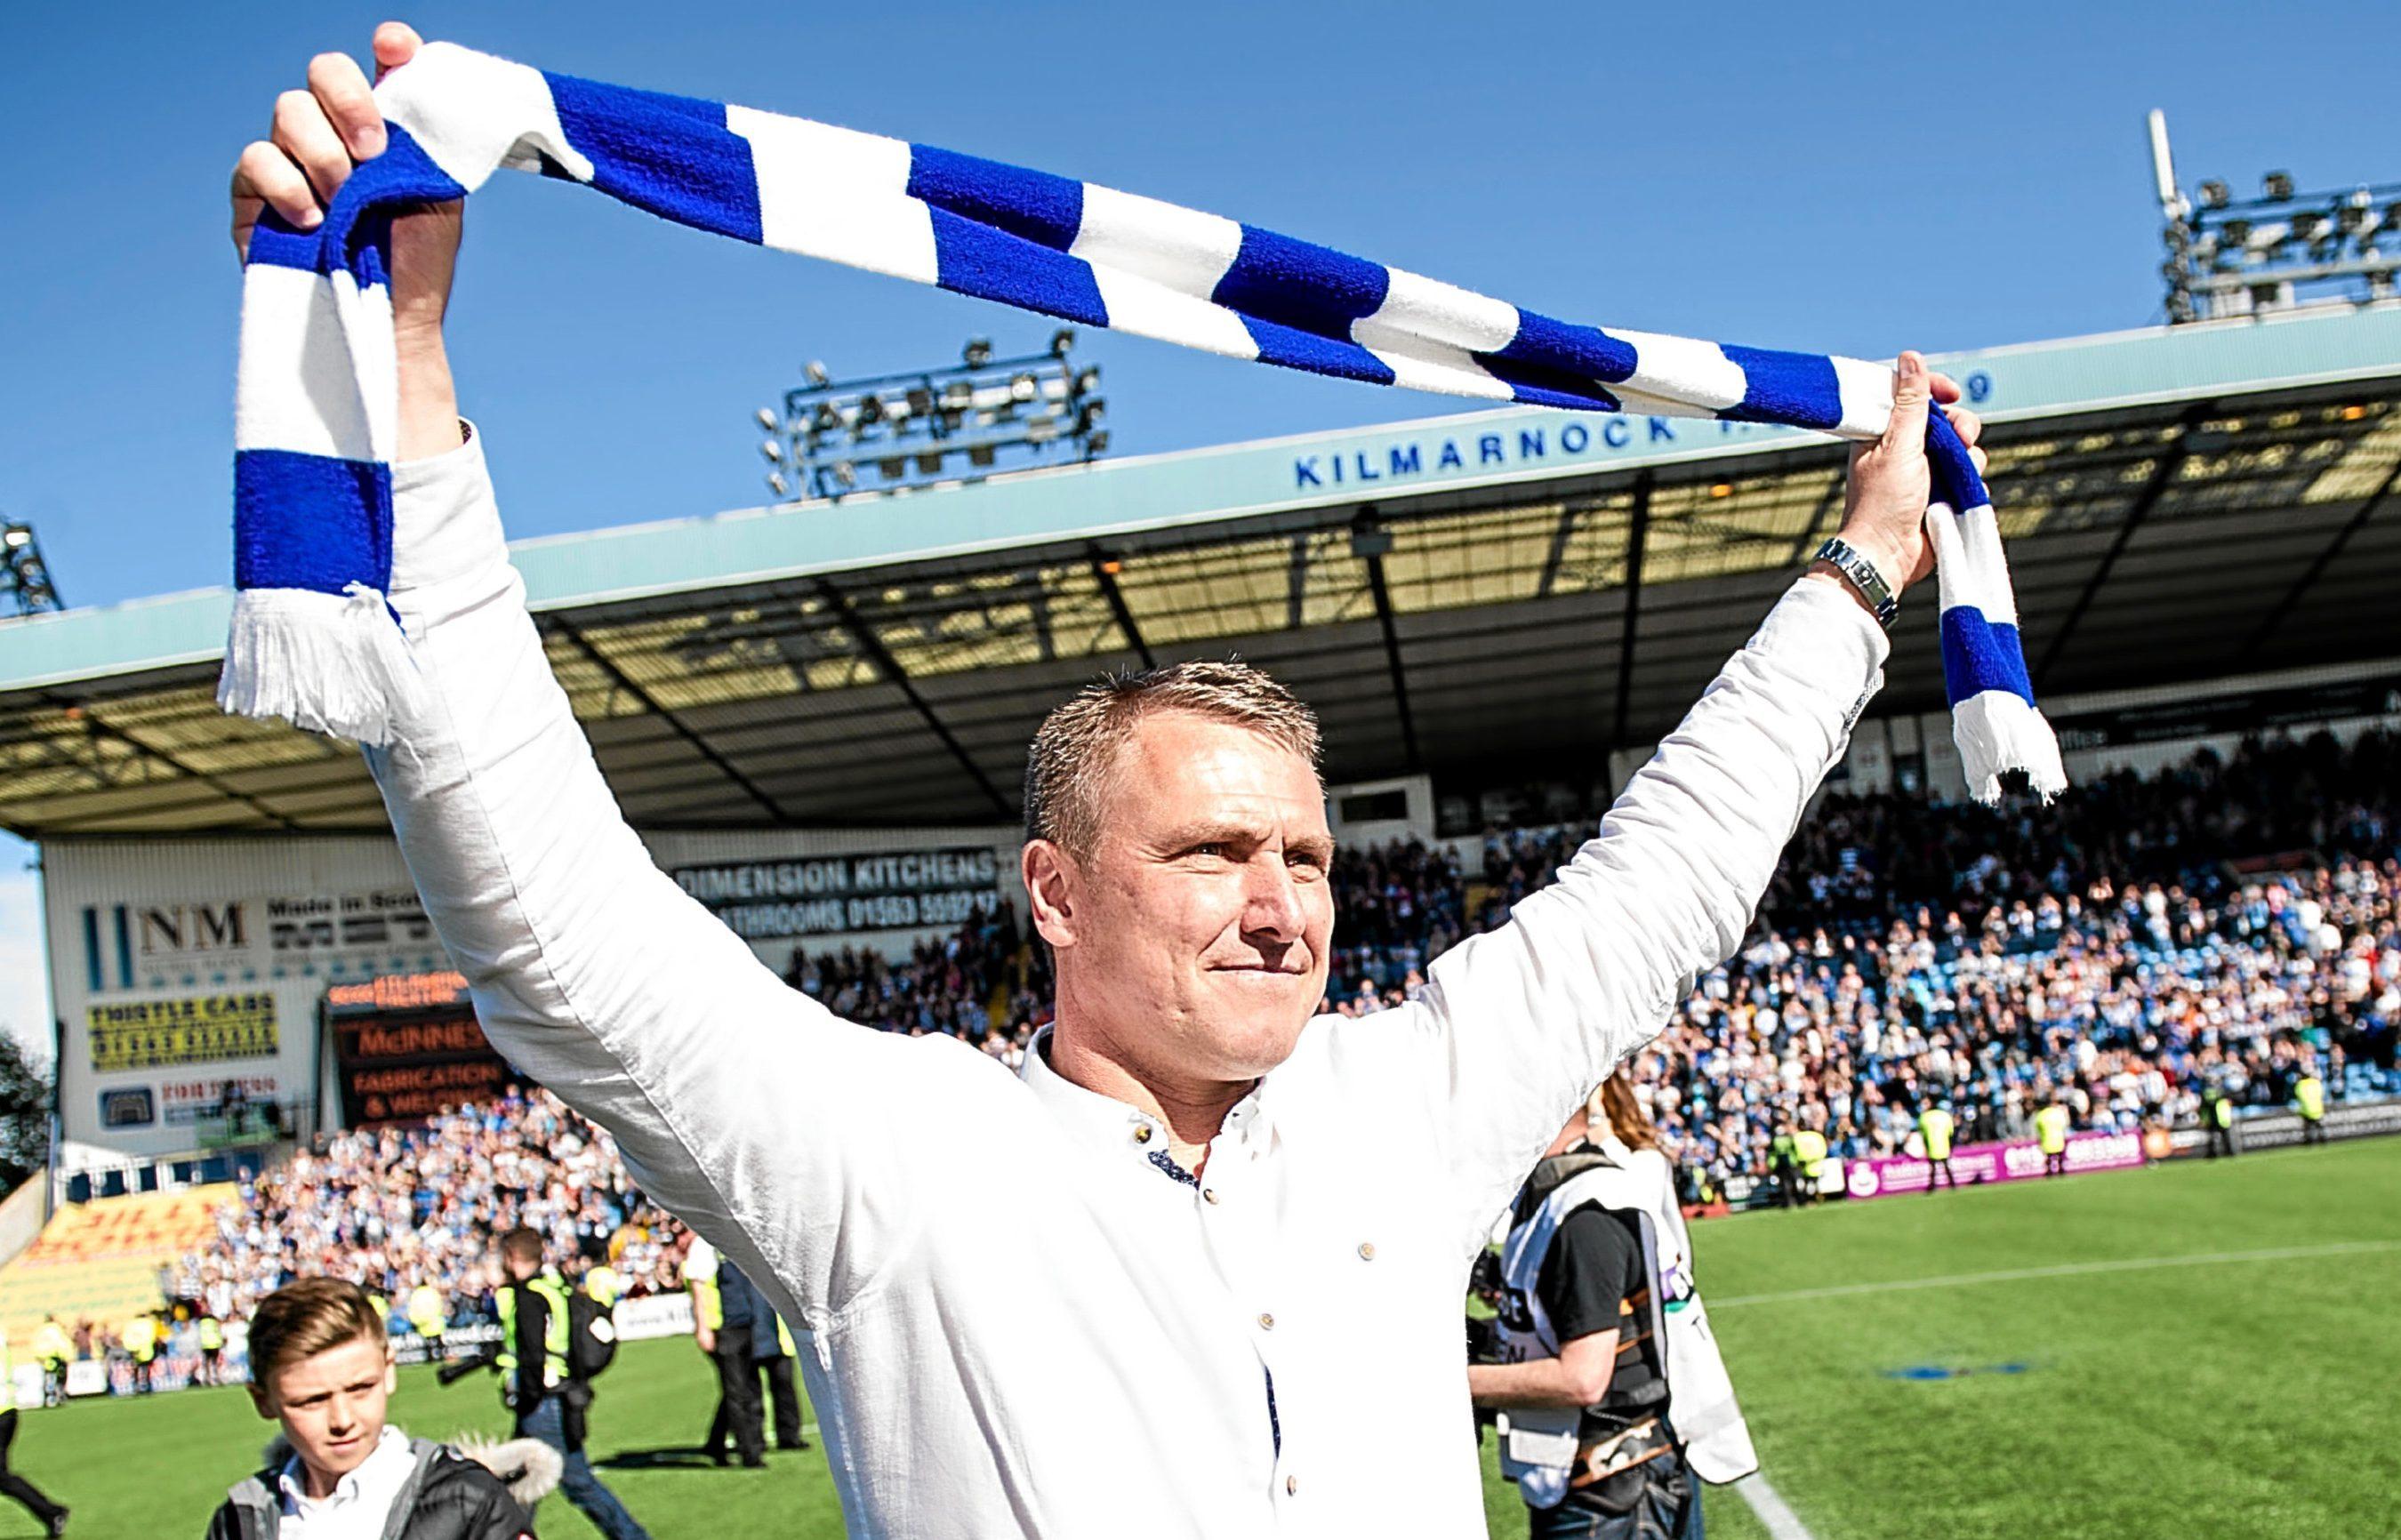 Kilmarnock manager Lee Clark celebrates at full time.